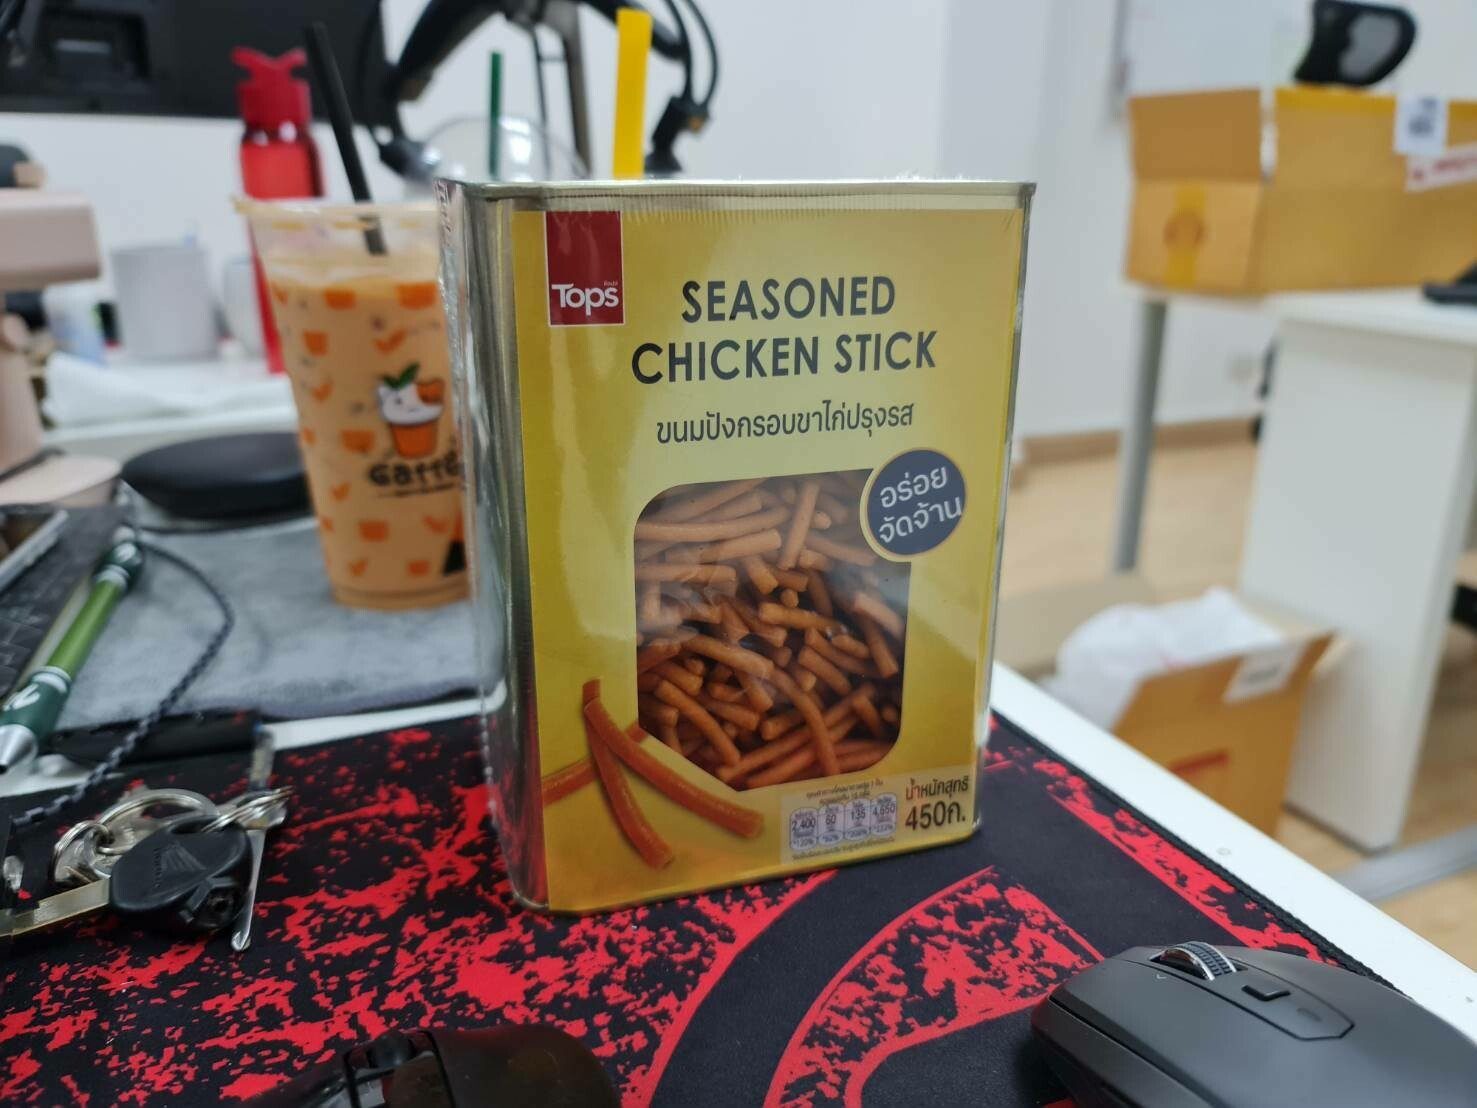 Seasoned Chicken Stick